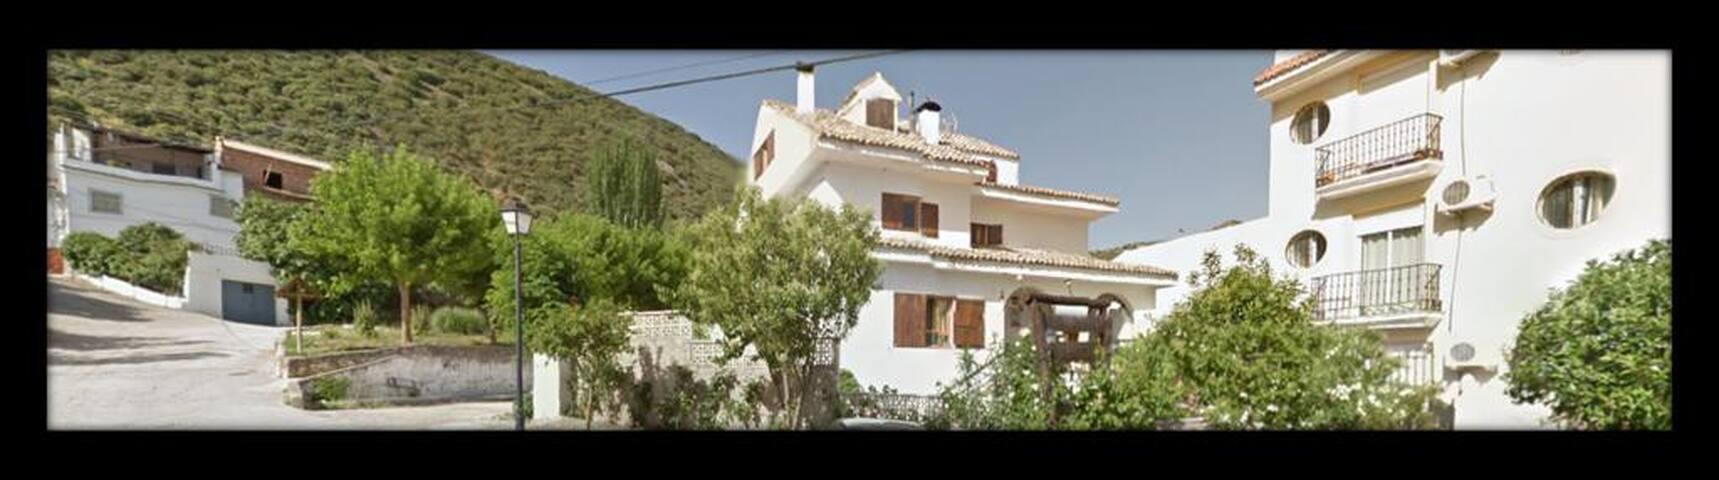 Casa Rural Sierra Mágina - Cambil